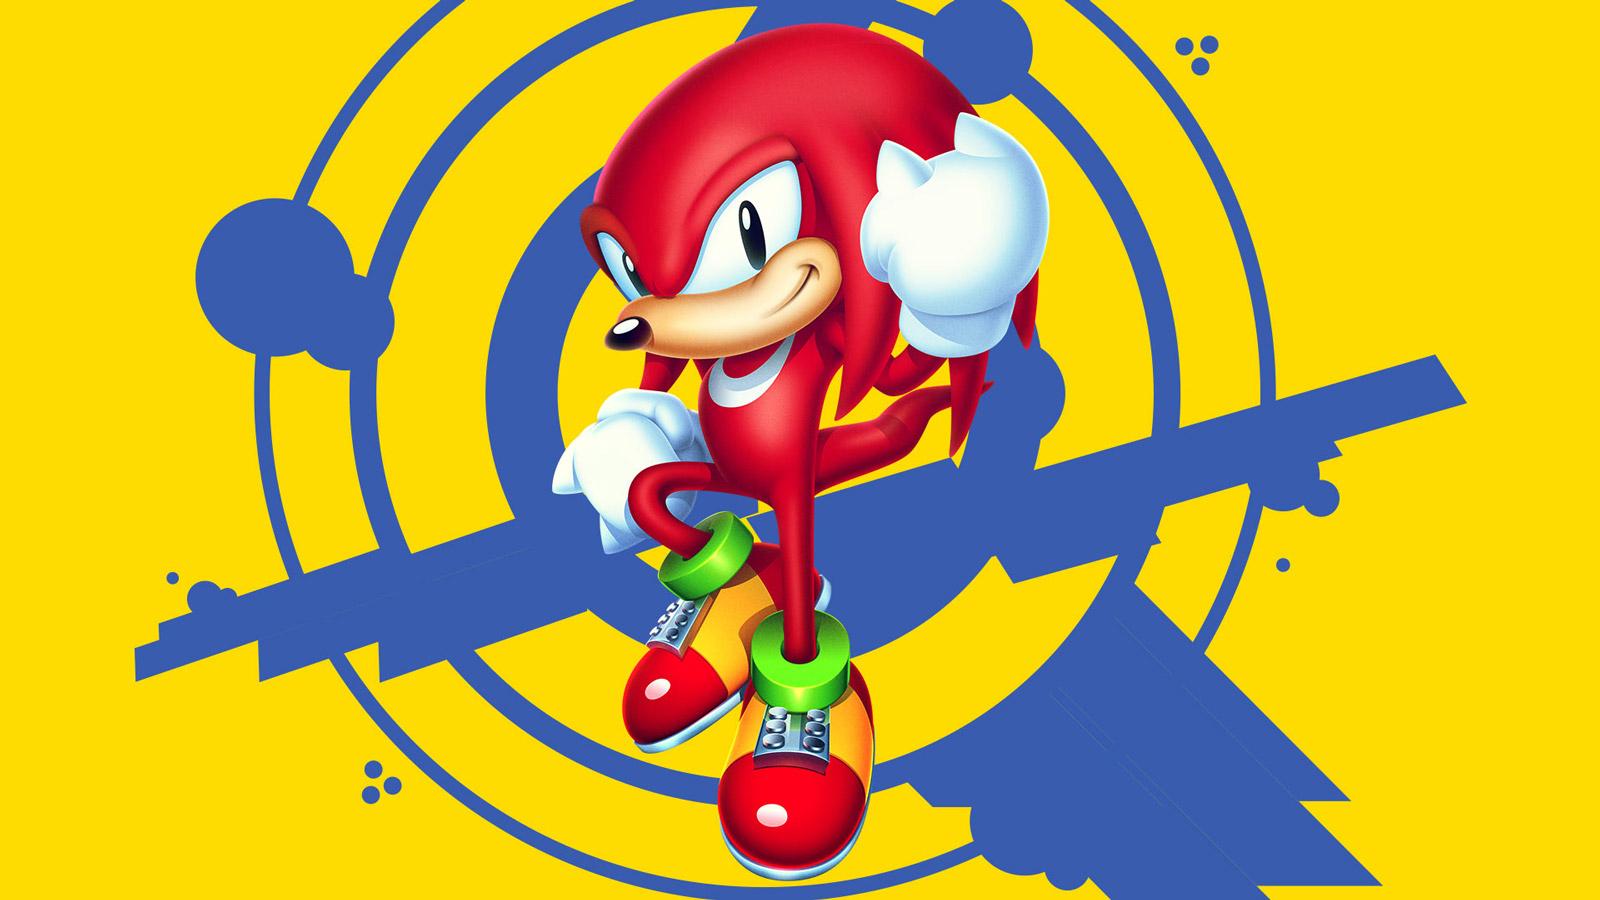 Free Sonic Mania Wallpaper in 1600x900